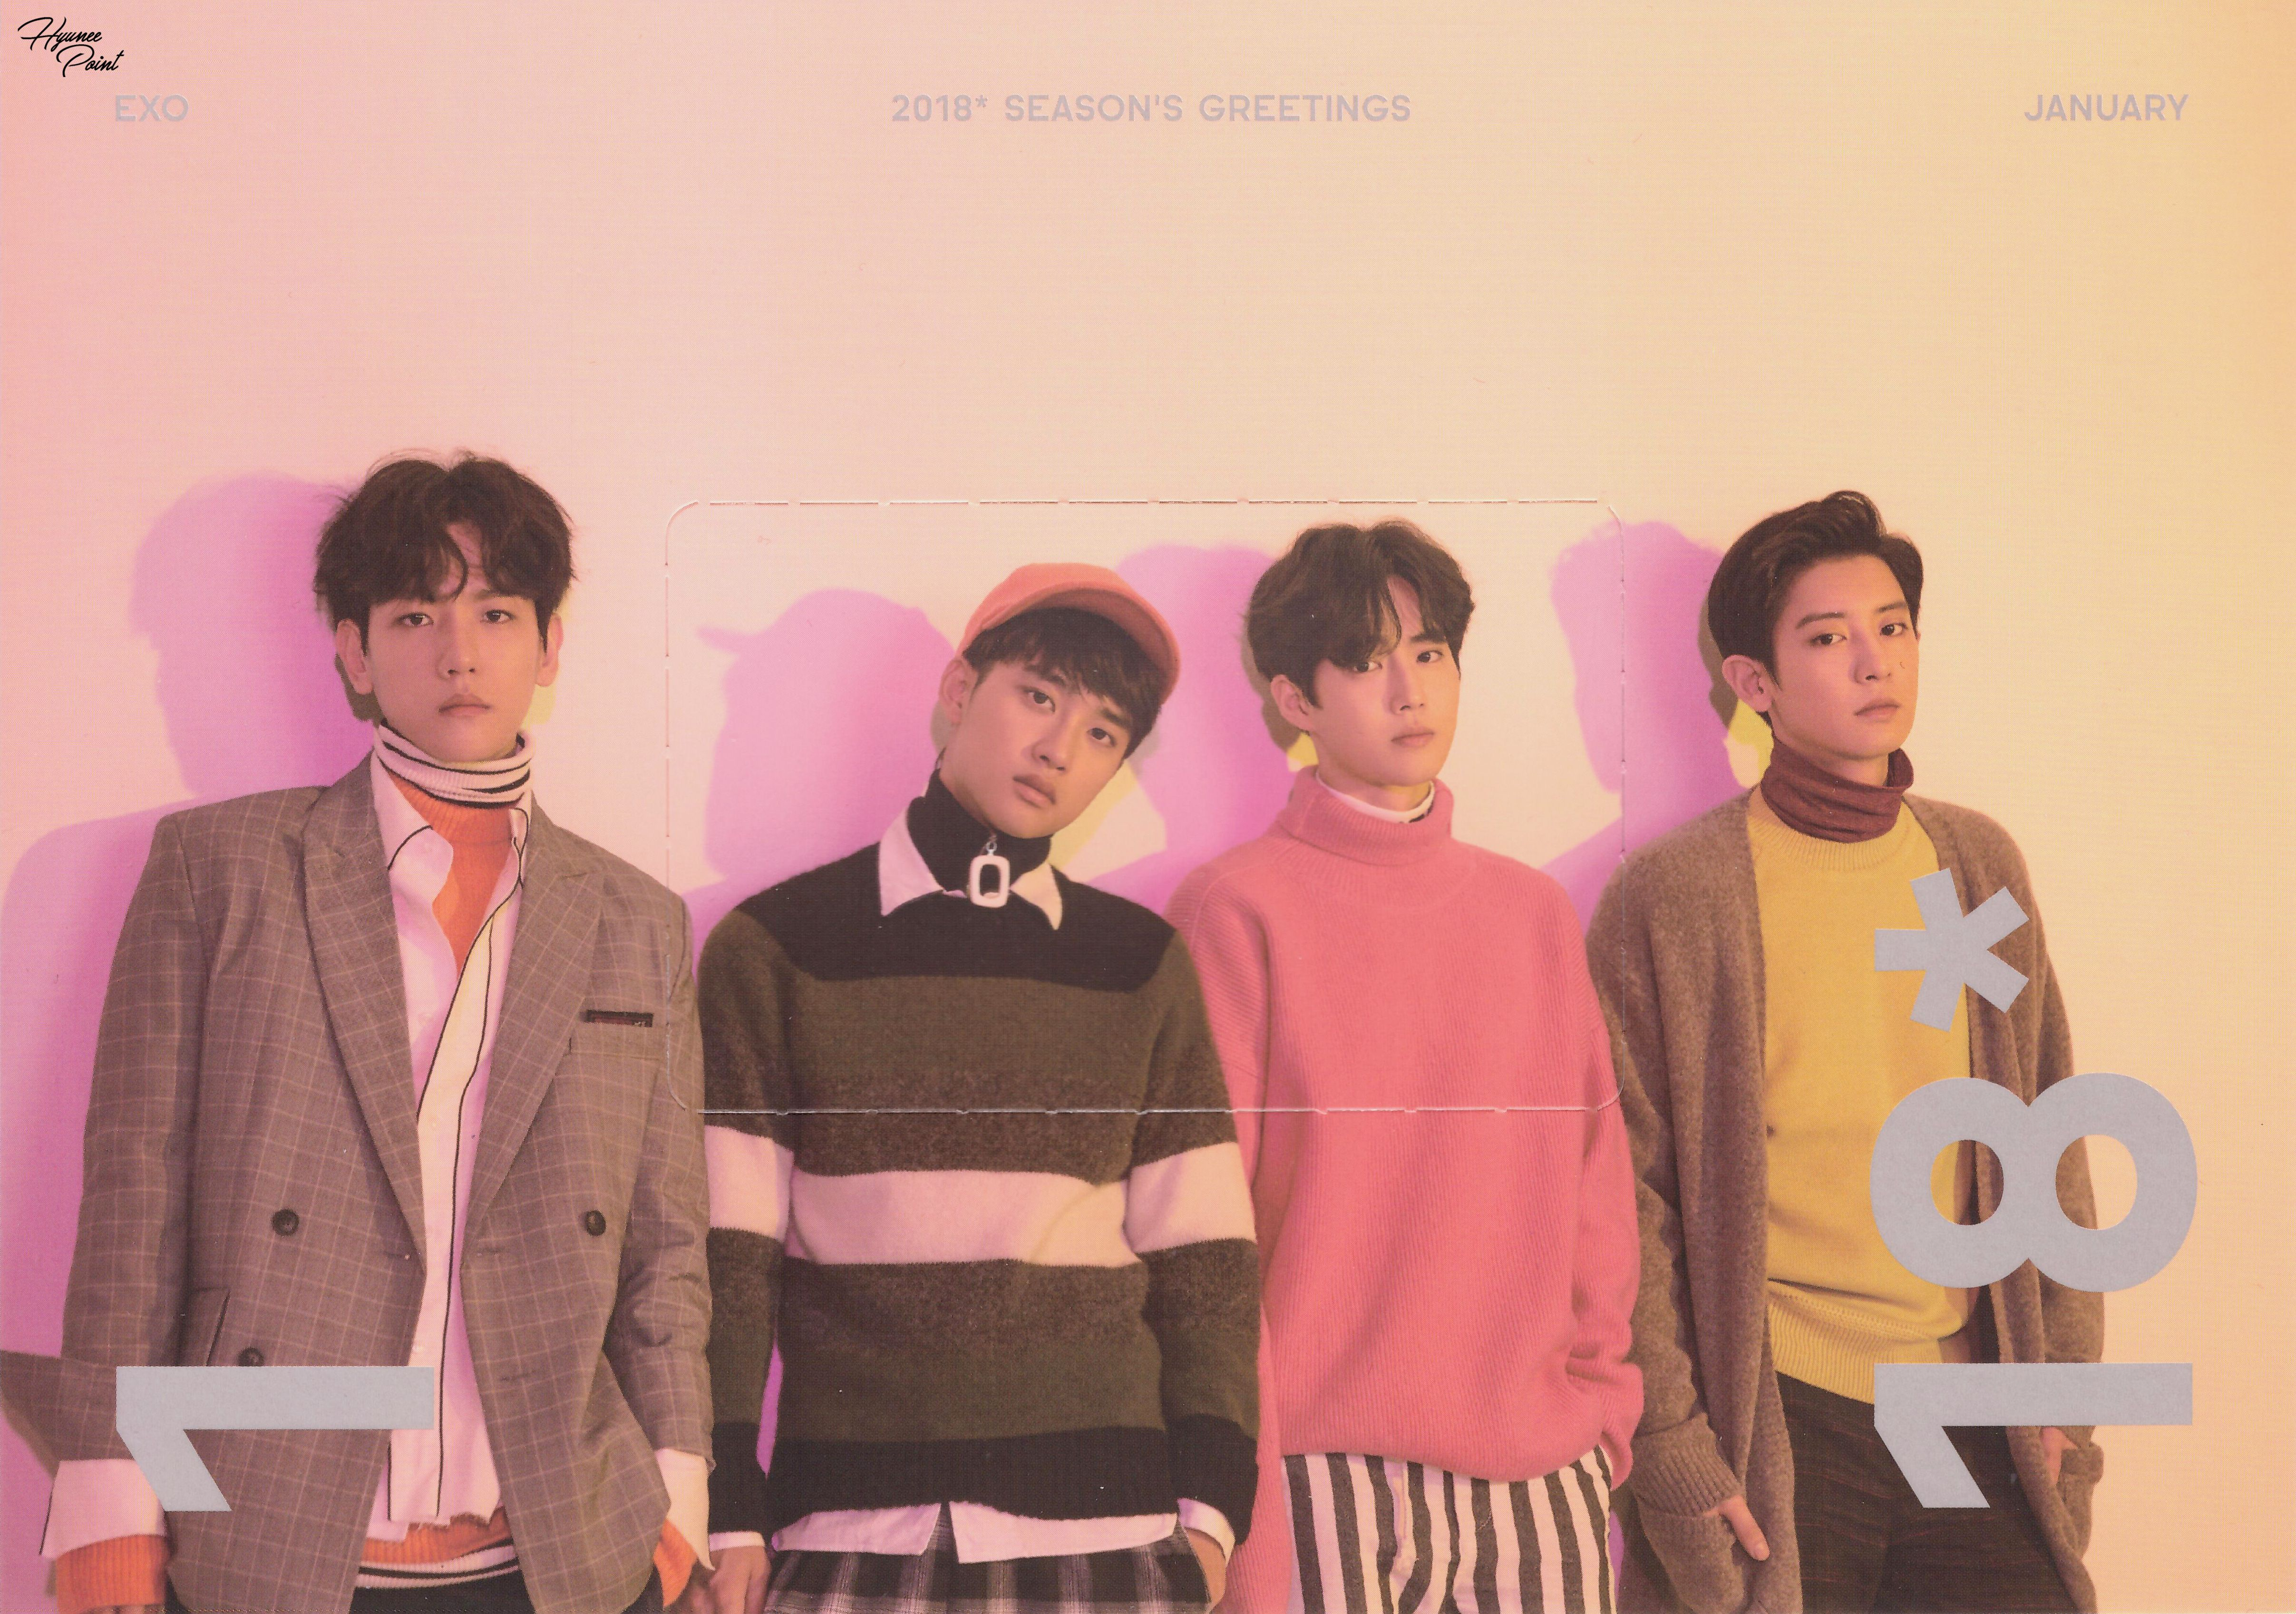 Scan seasons greetings 2018 exo chanyeol chanyeol shots baekhyun do suho chanyeol 171222 2018 seasons greetings official calendar kristyandbryce Images